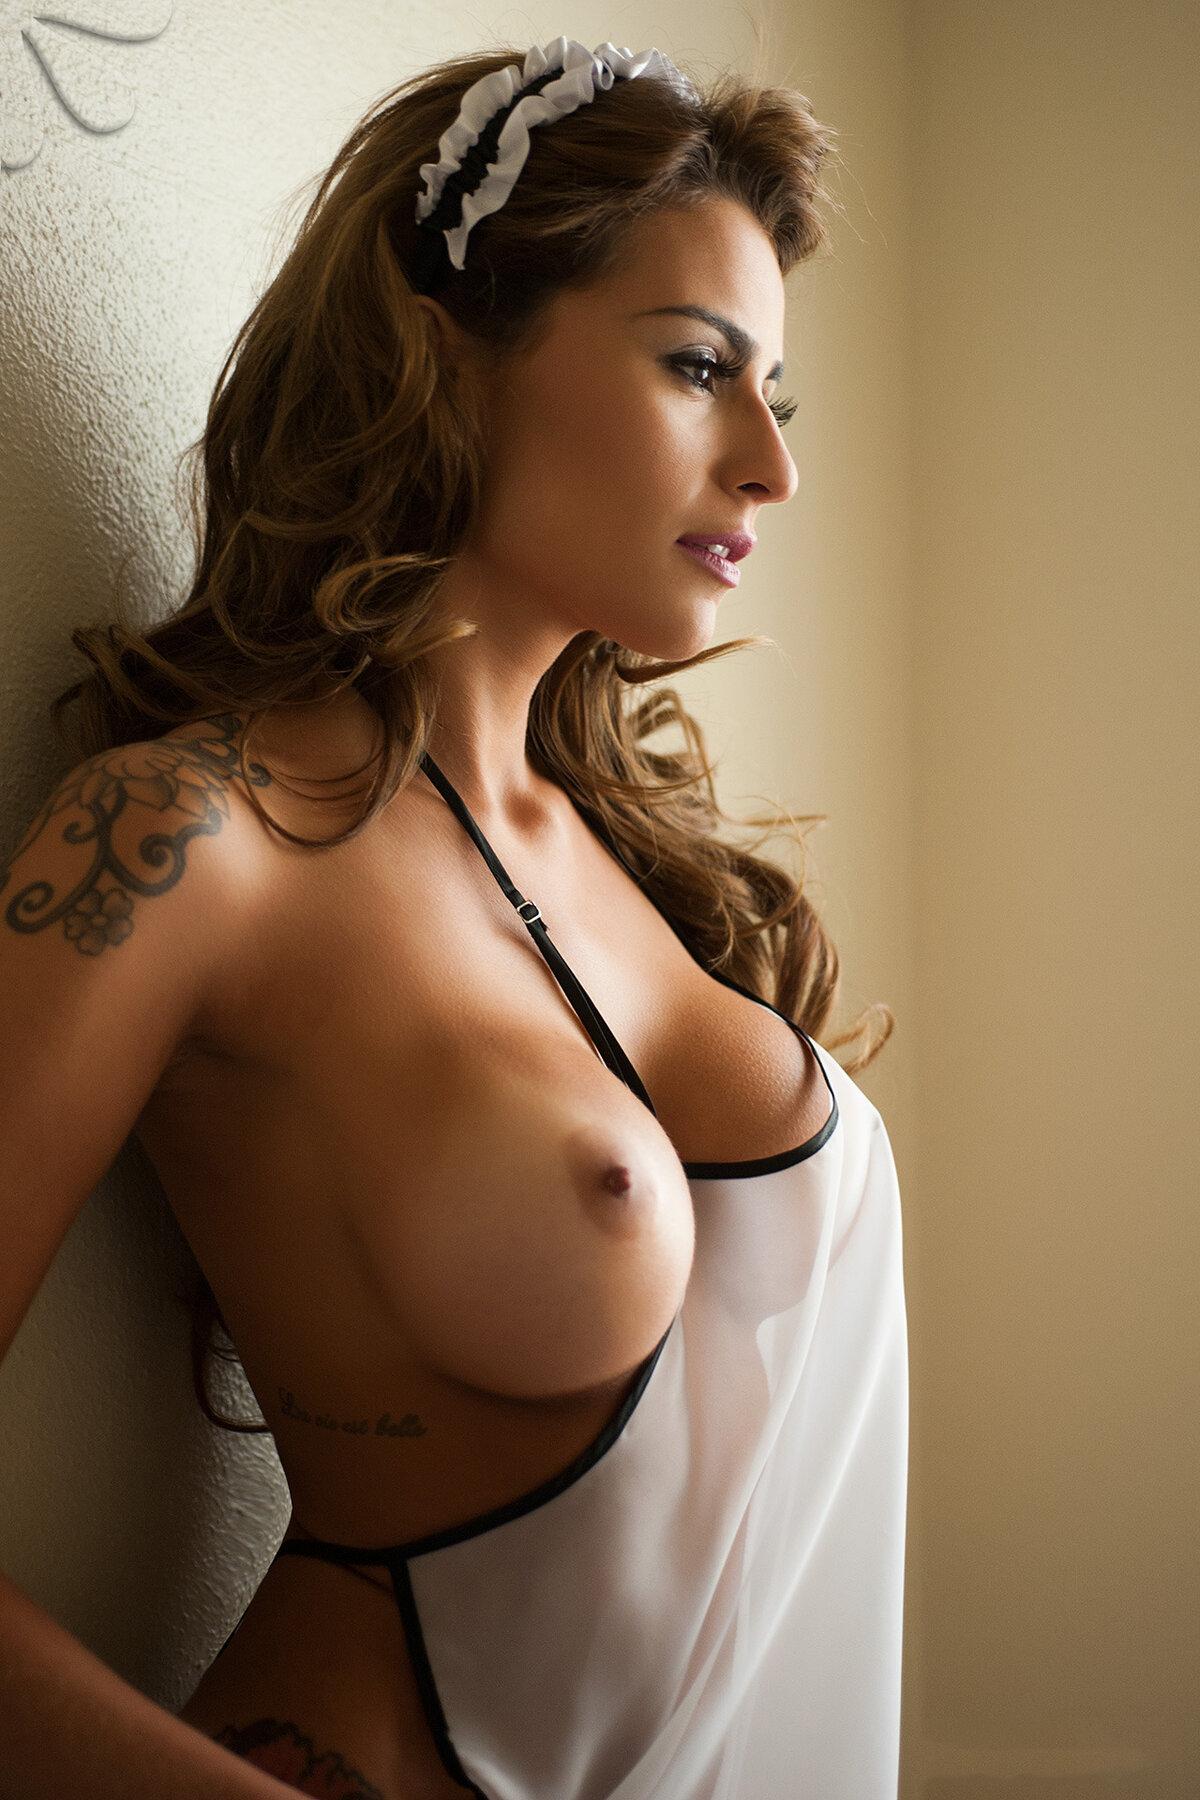 Hot babes nipples